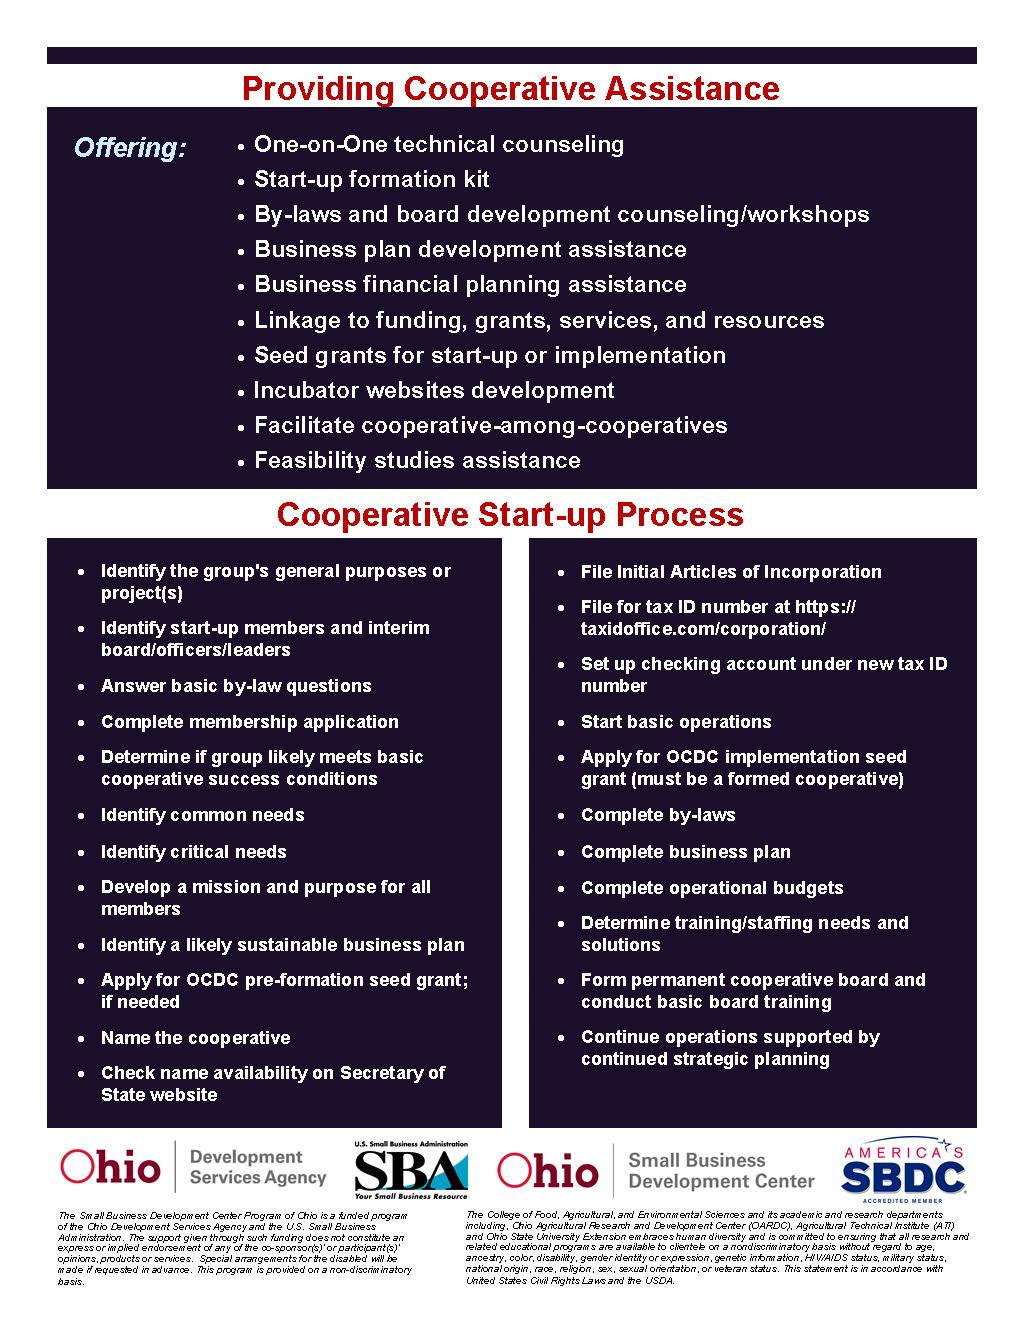 Check availability of business name ohio - Ohio Cooperative Development Center Ohio Cooperative Development Center 2